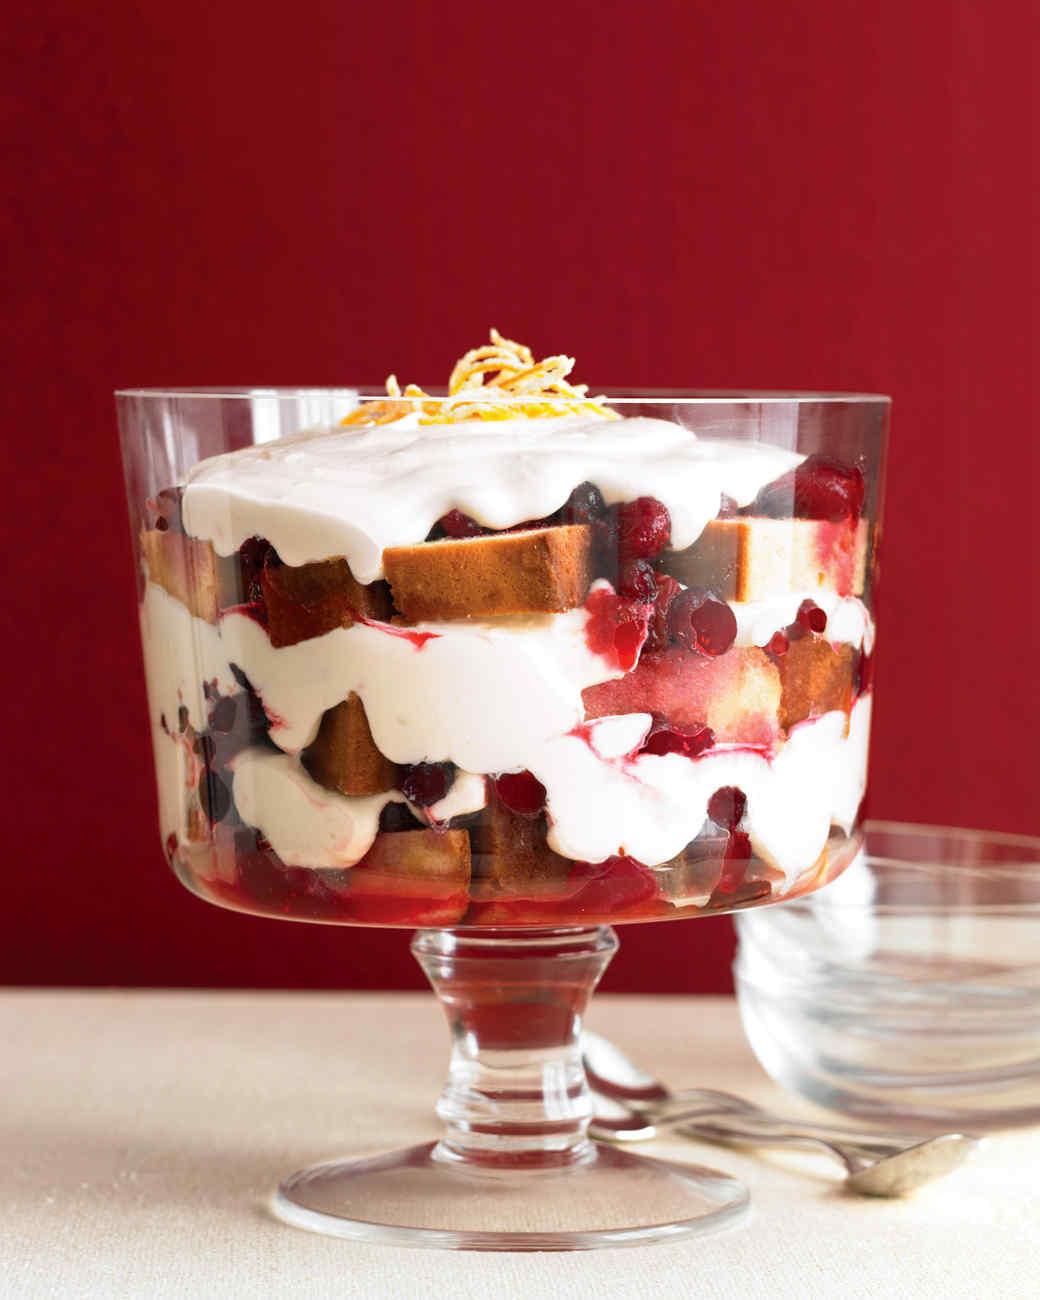 Christmas Trifle Dessert  12 Impressive Holiday Trifle Recipes